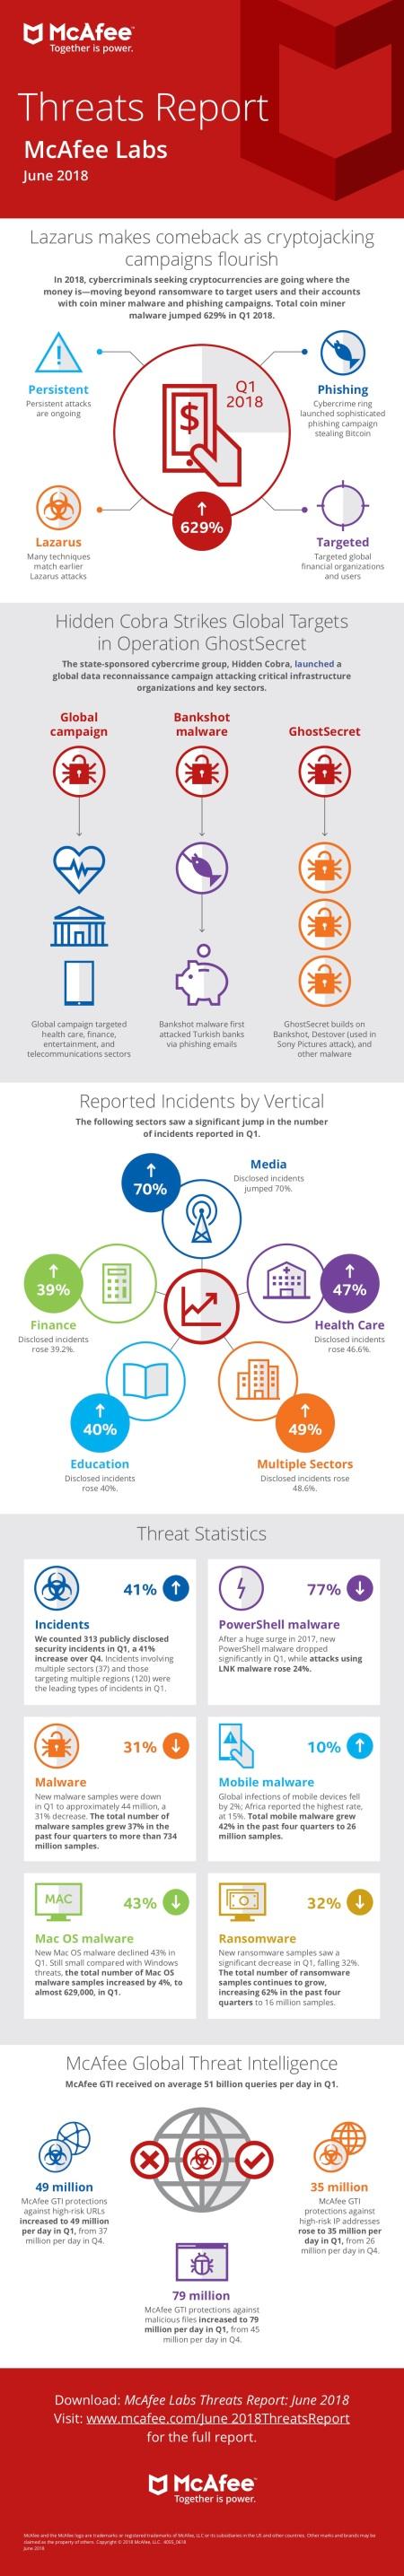 infographic-threats-report-jun-2018.jpg